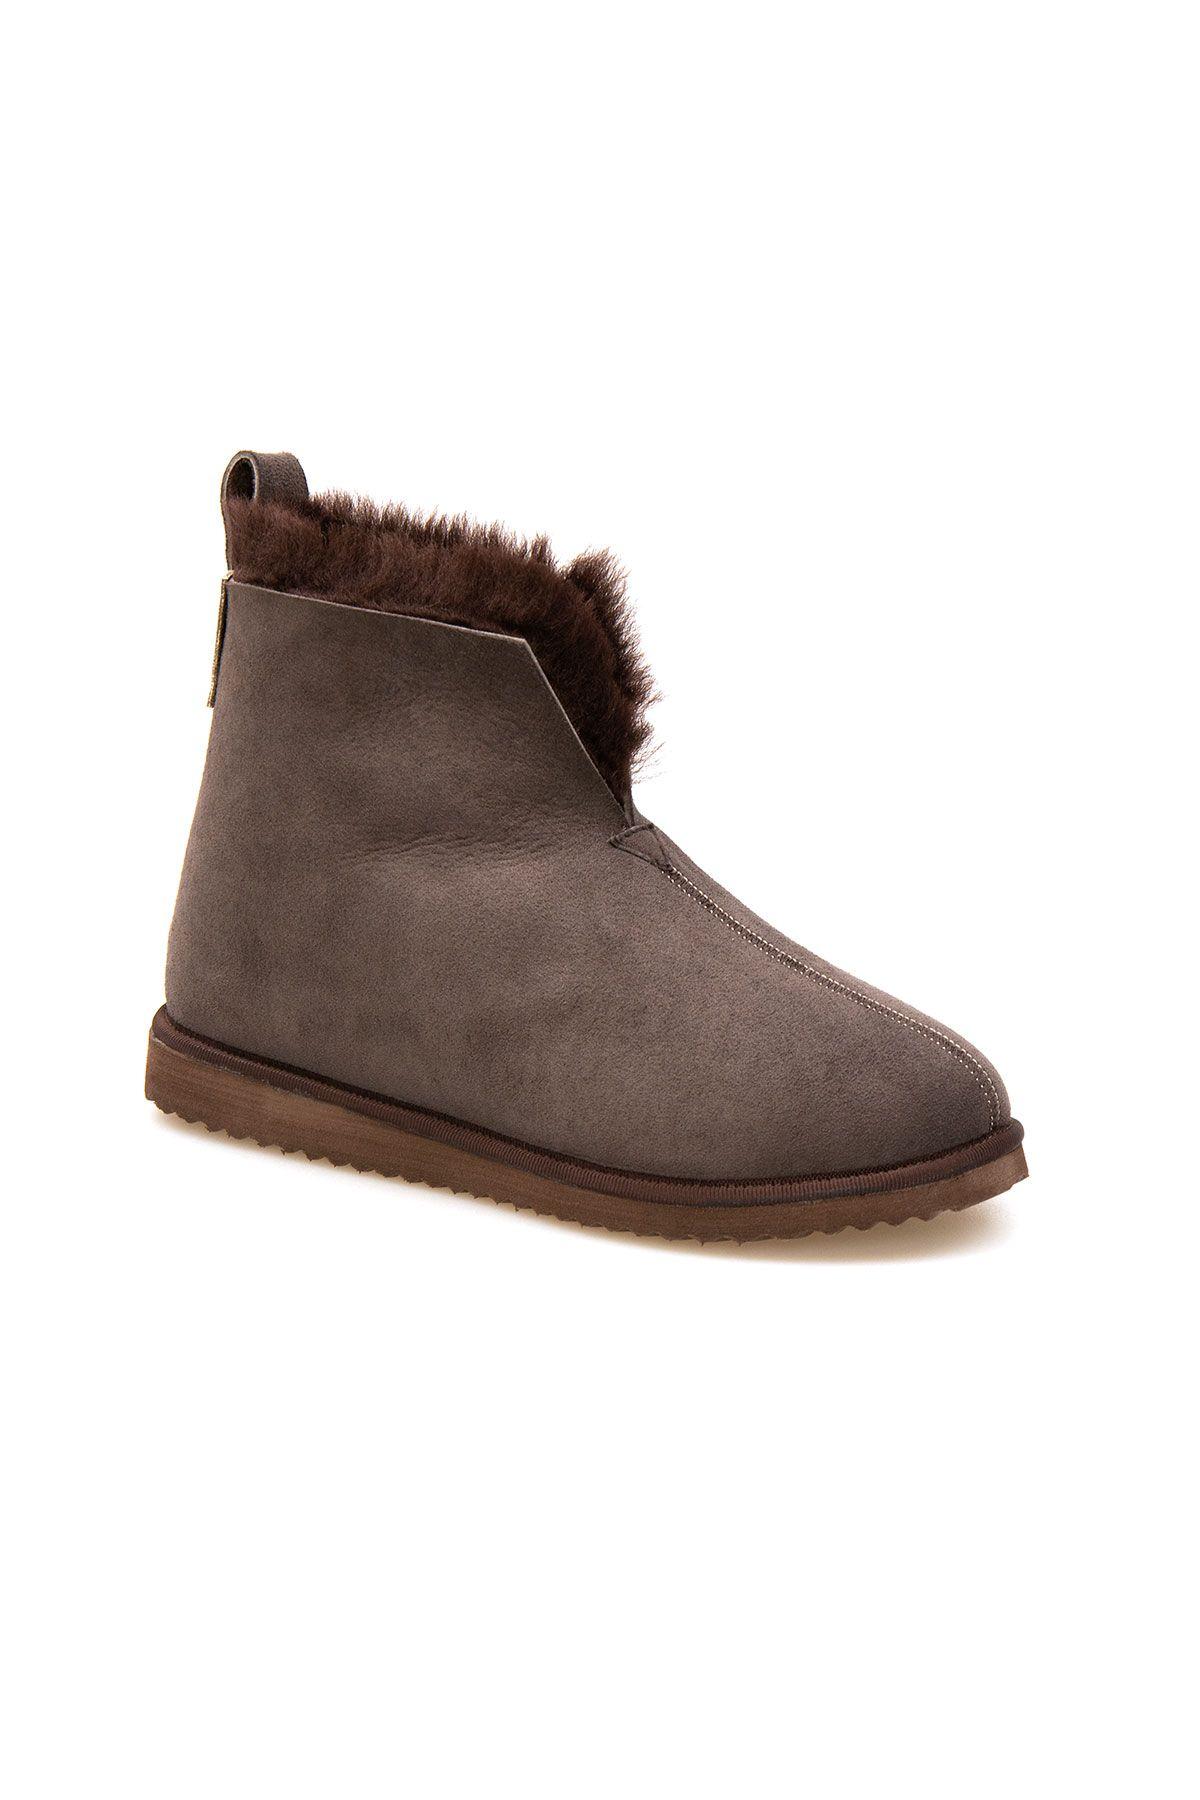 Pegia Sheepskin Women's House Boots 191200 Brown